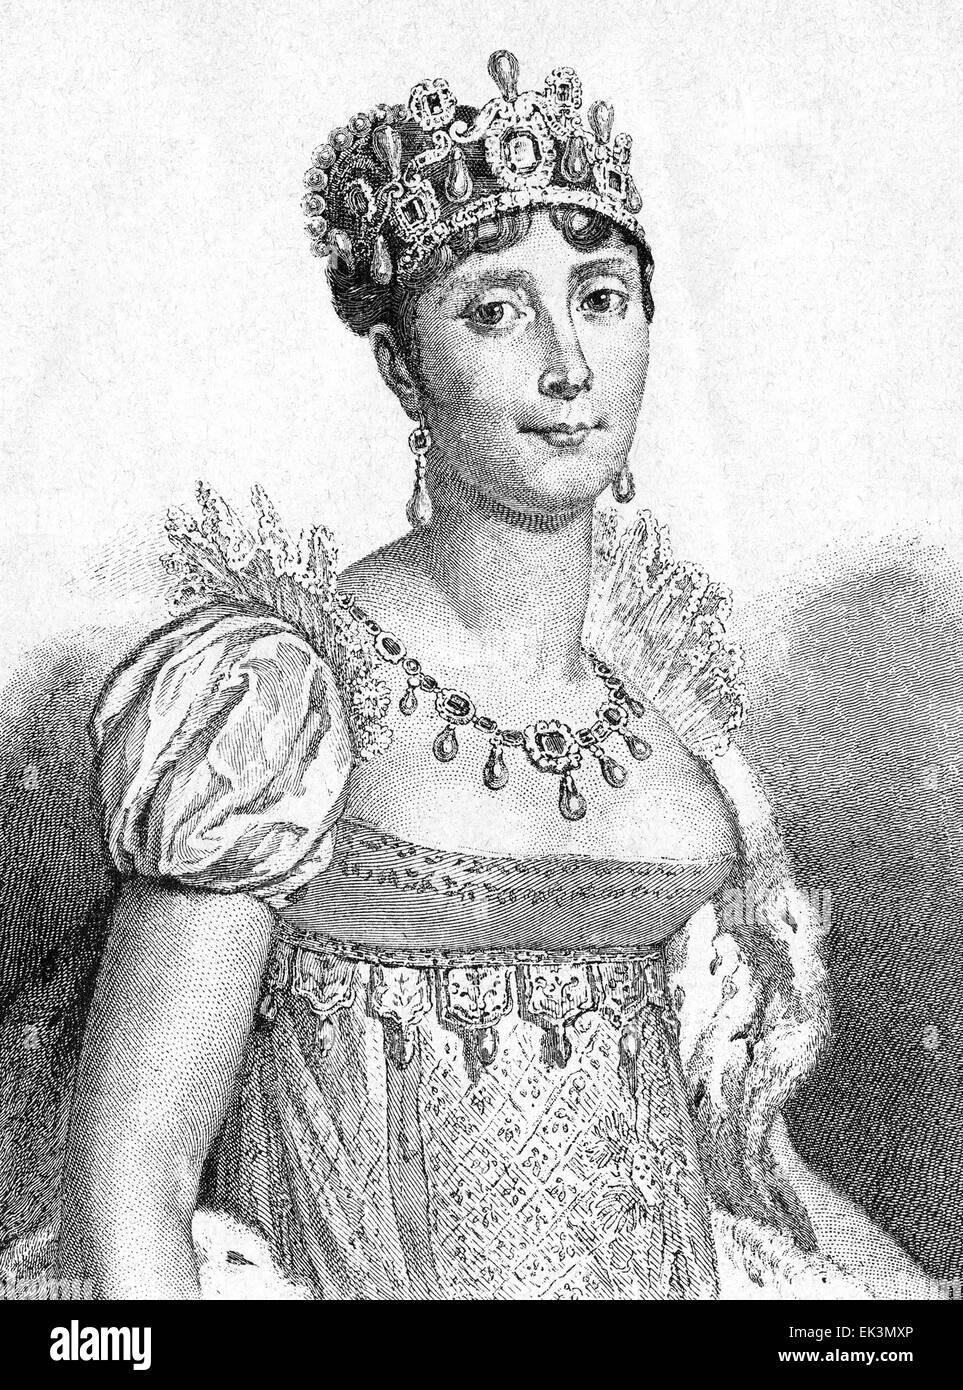 Empress Josephine de Beauharnais, Consort to Napoleon I, of France, at her Coronation, 1804 - Stock Image